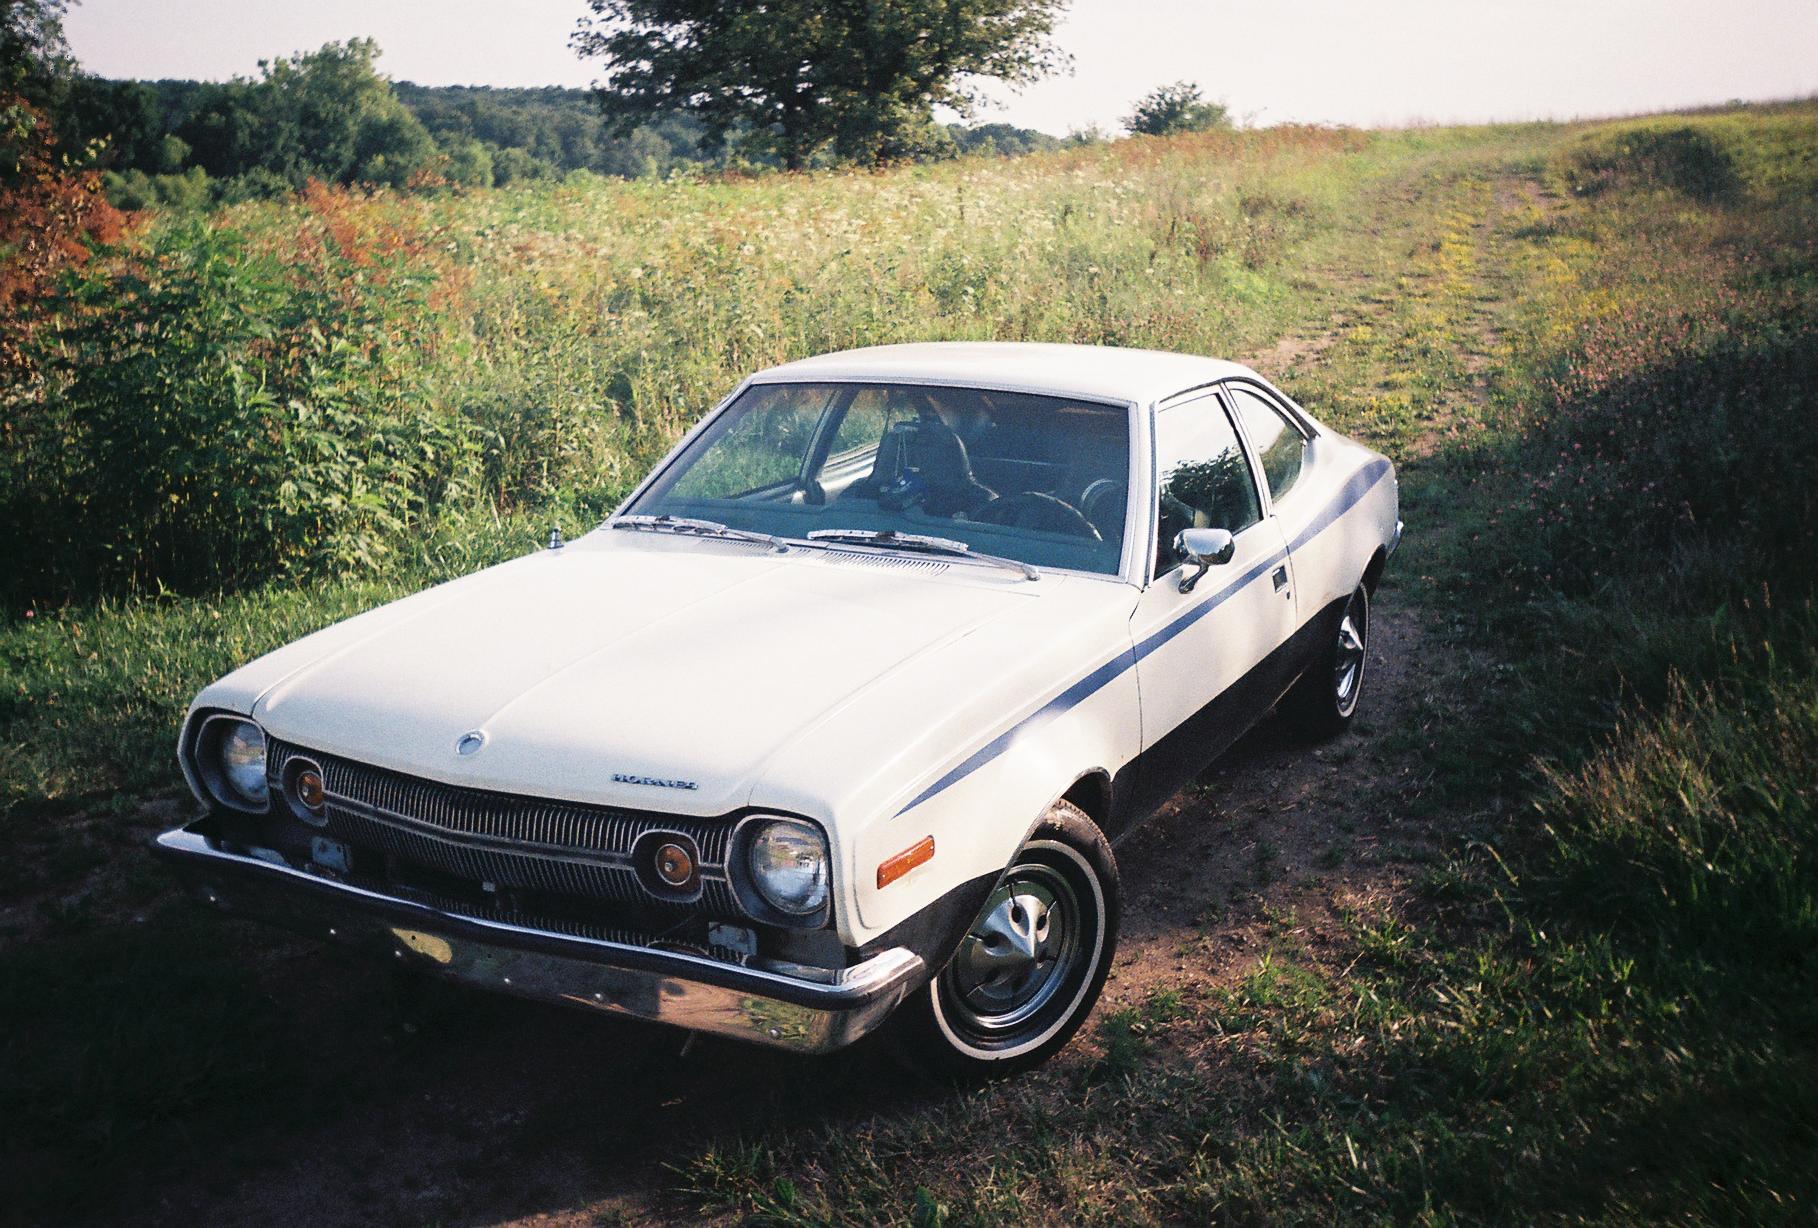 File:1973 AMC American Motors hornet 258 2 door hatchback fastback